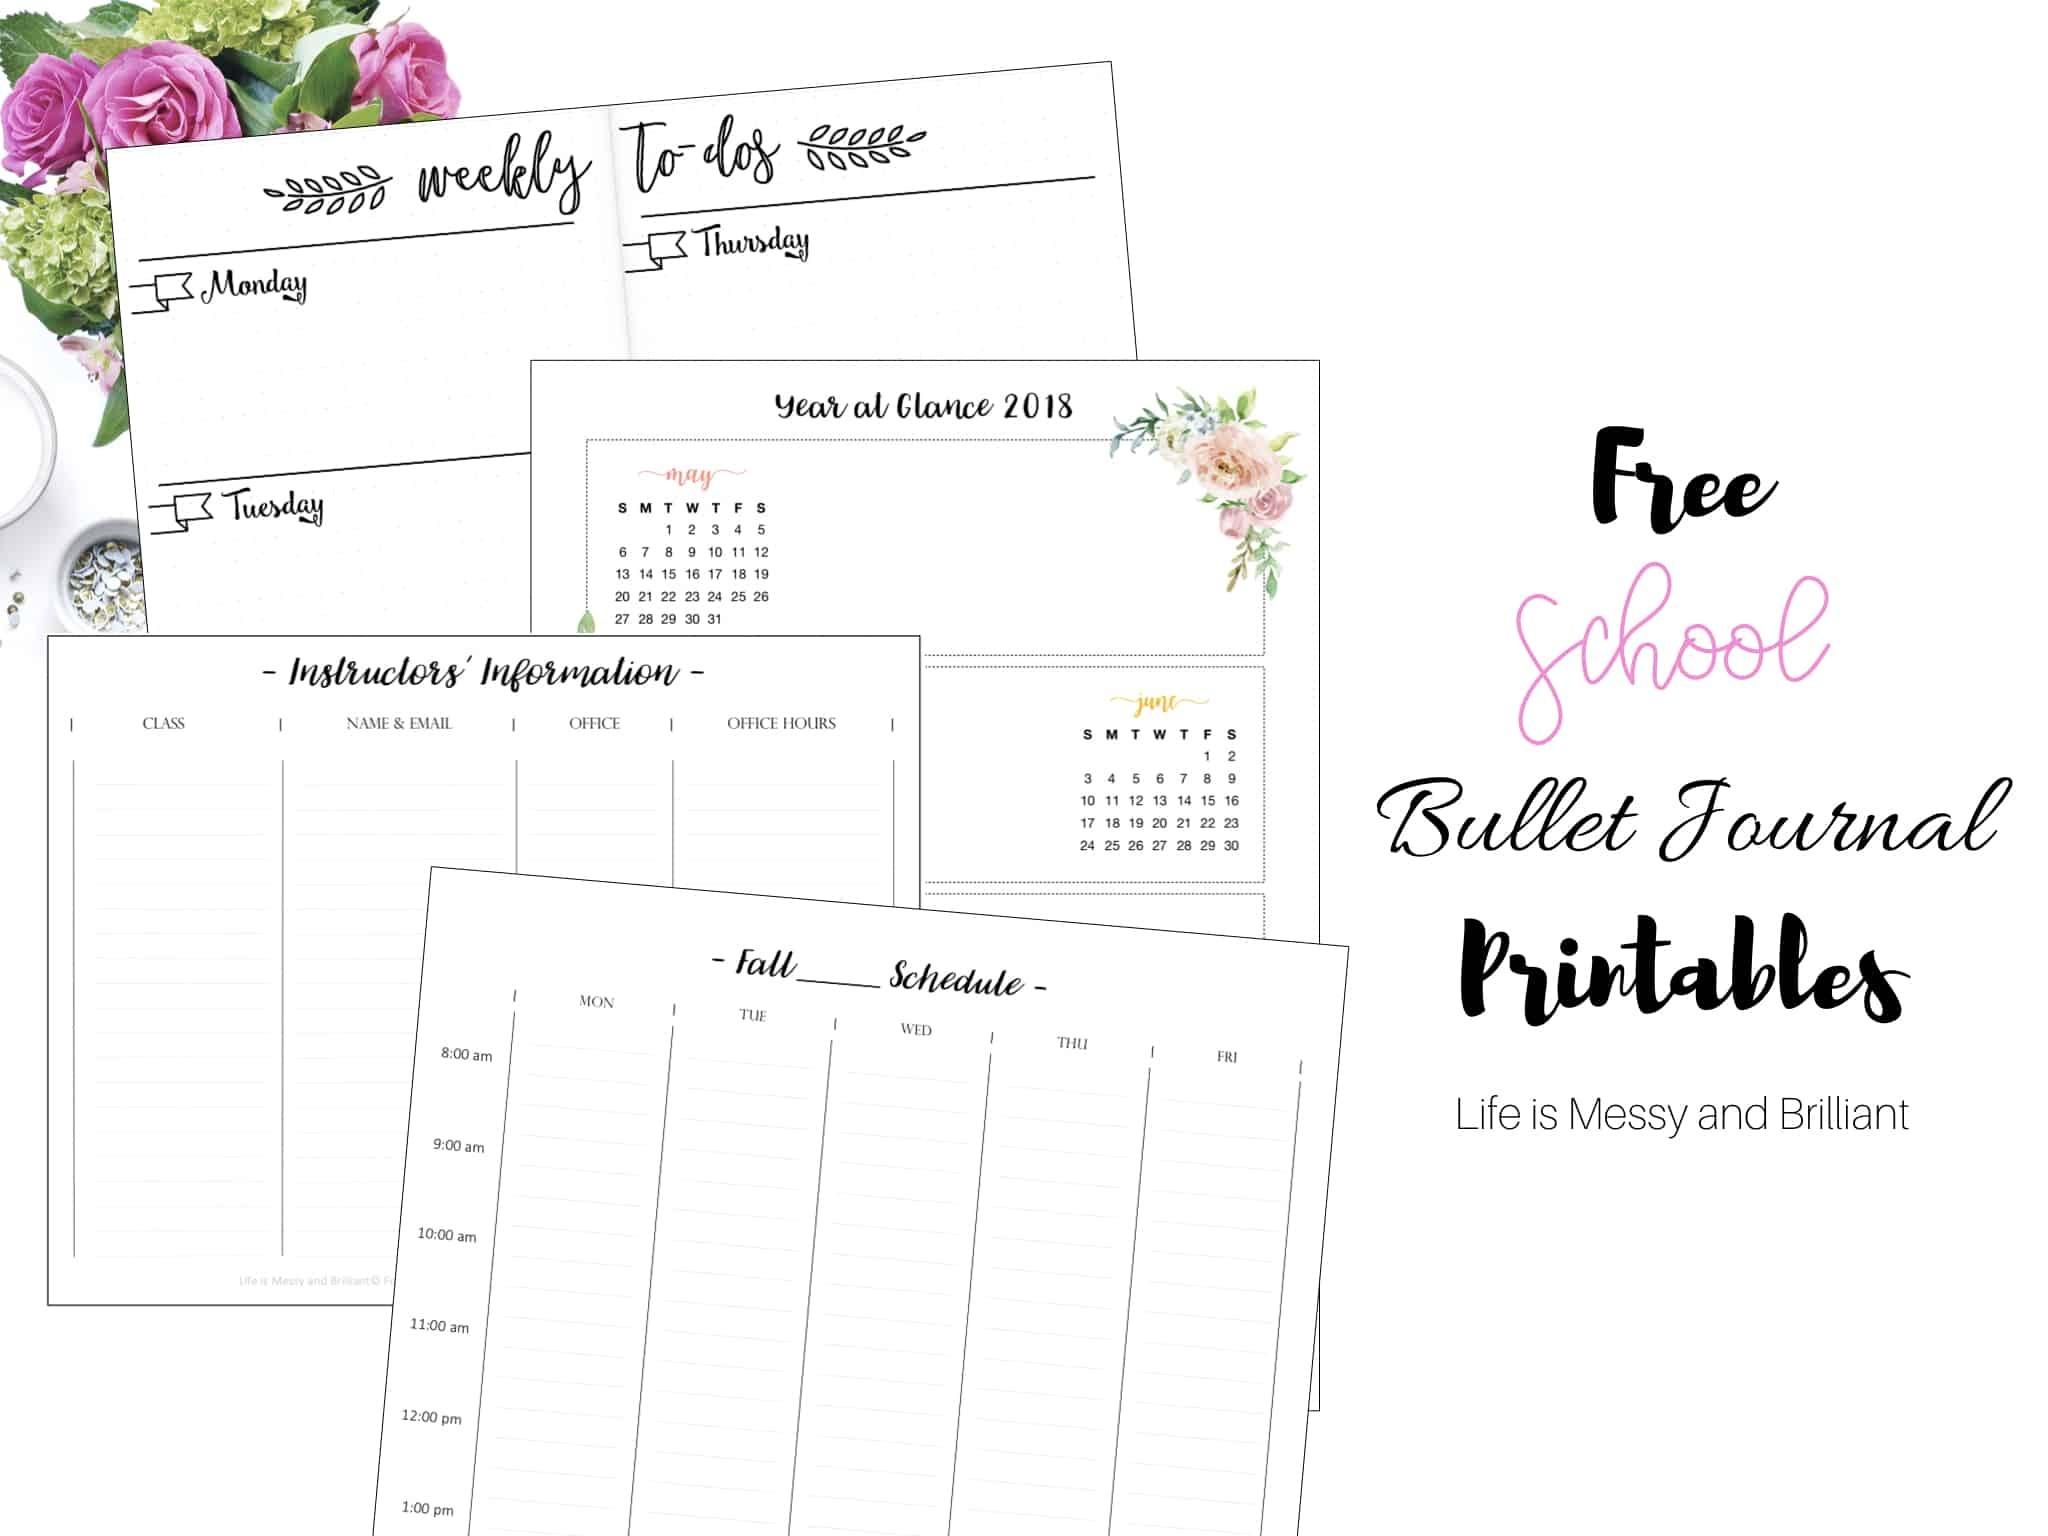 Free Bullet Journal Printables - Bullet Journal Printables Free